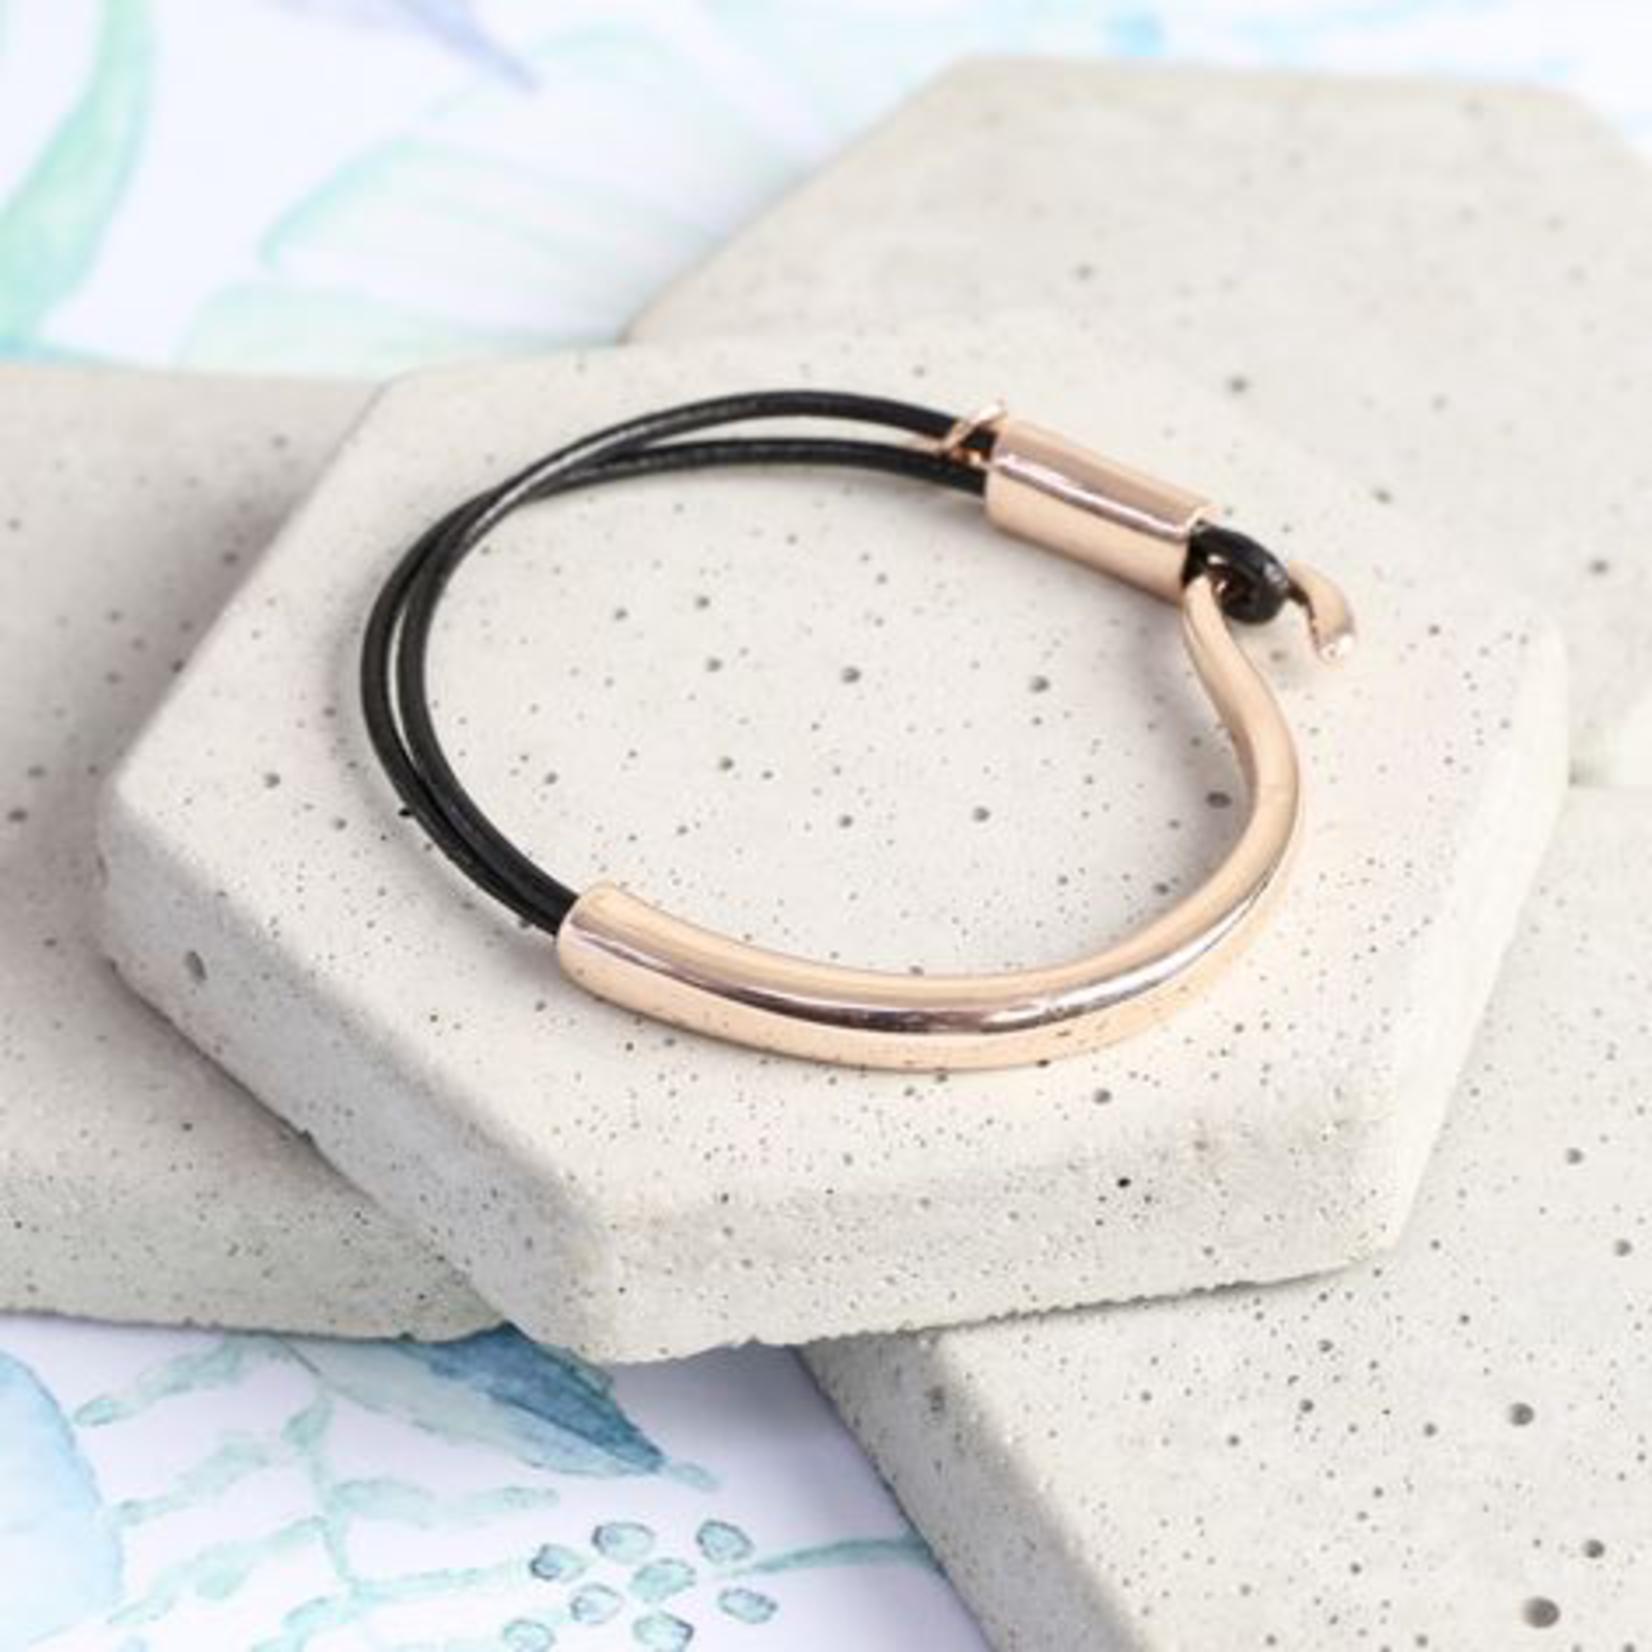 Lisa Angel Curved Metal and Black Leather Bracelet in Rose Gold S/M